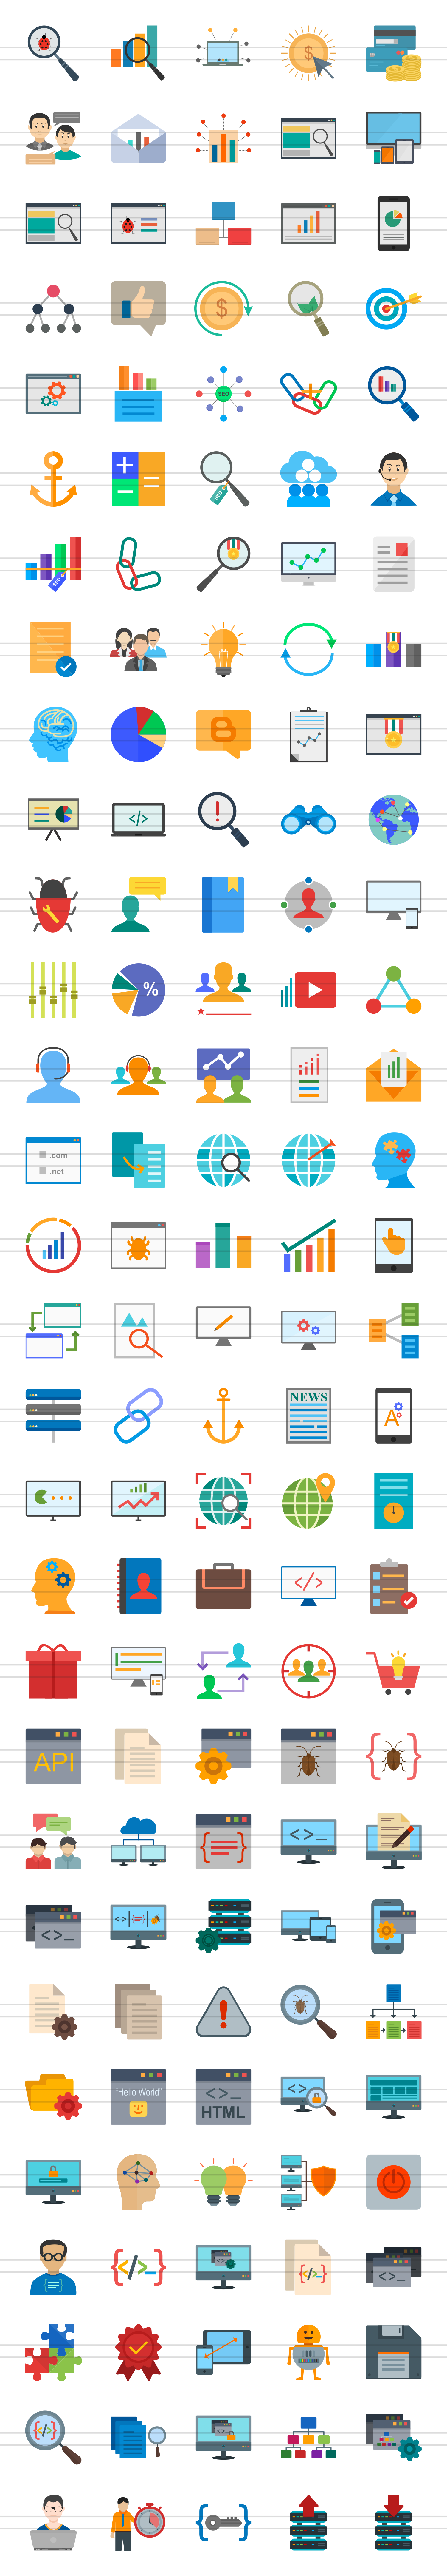 150 SEO & Development Flat Icons example image 2